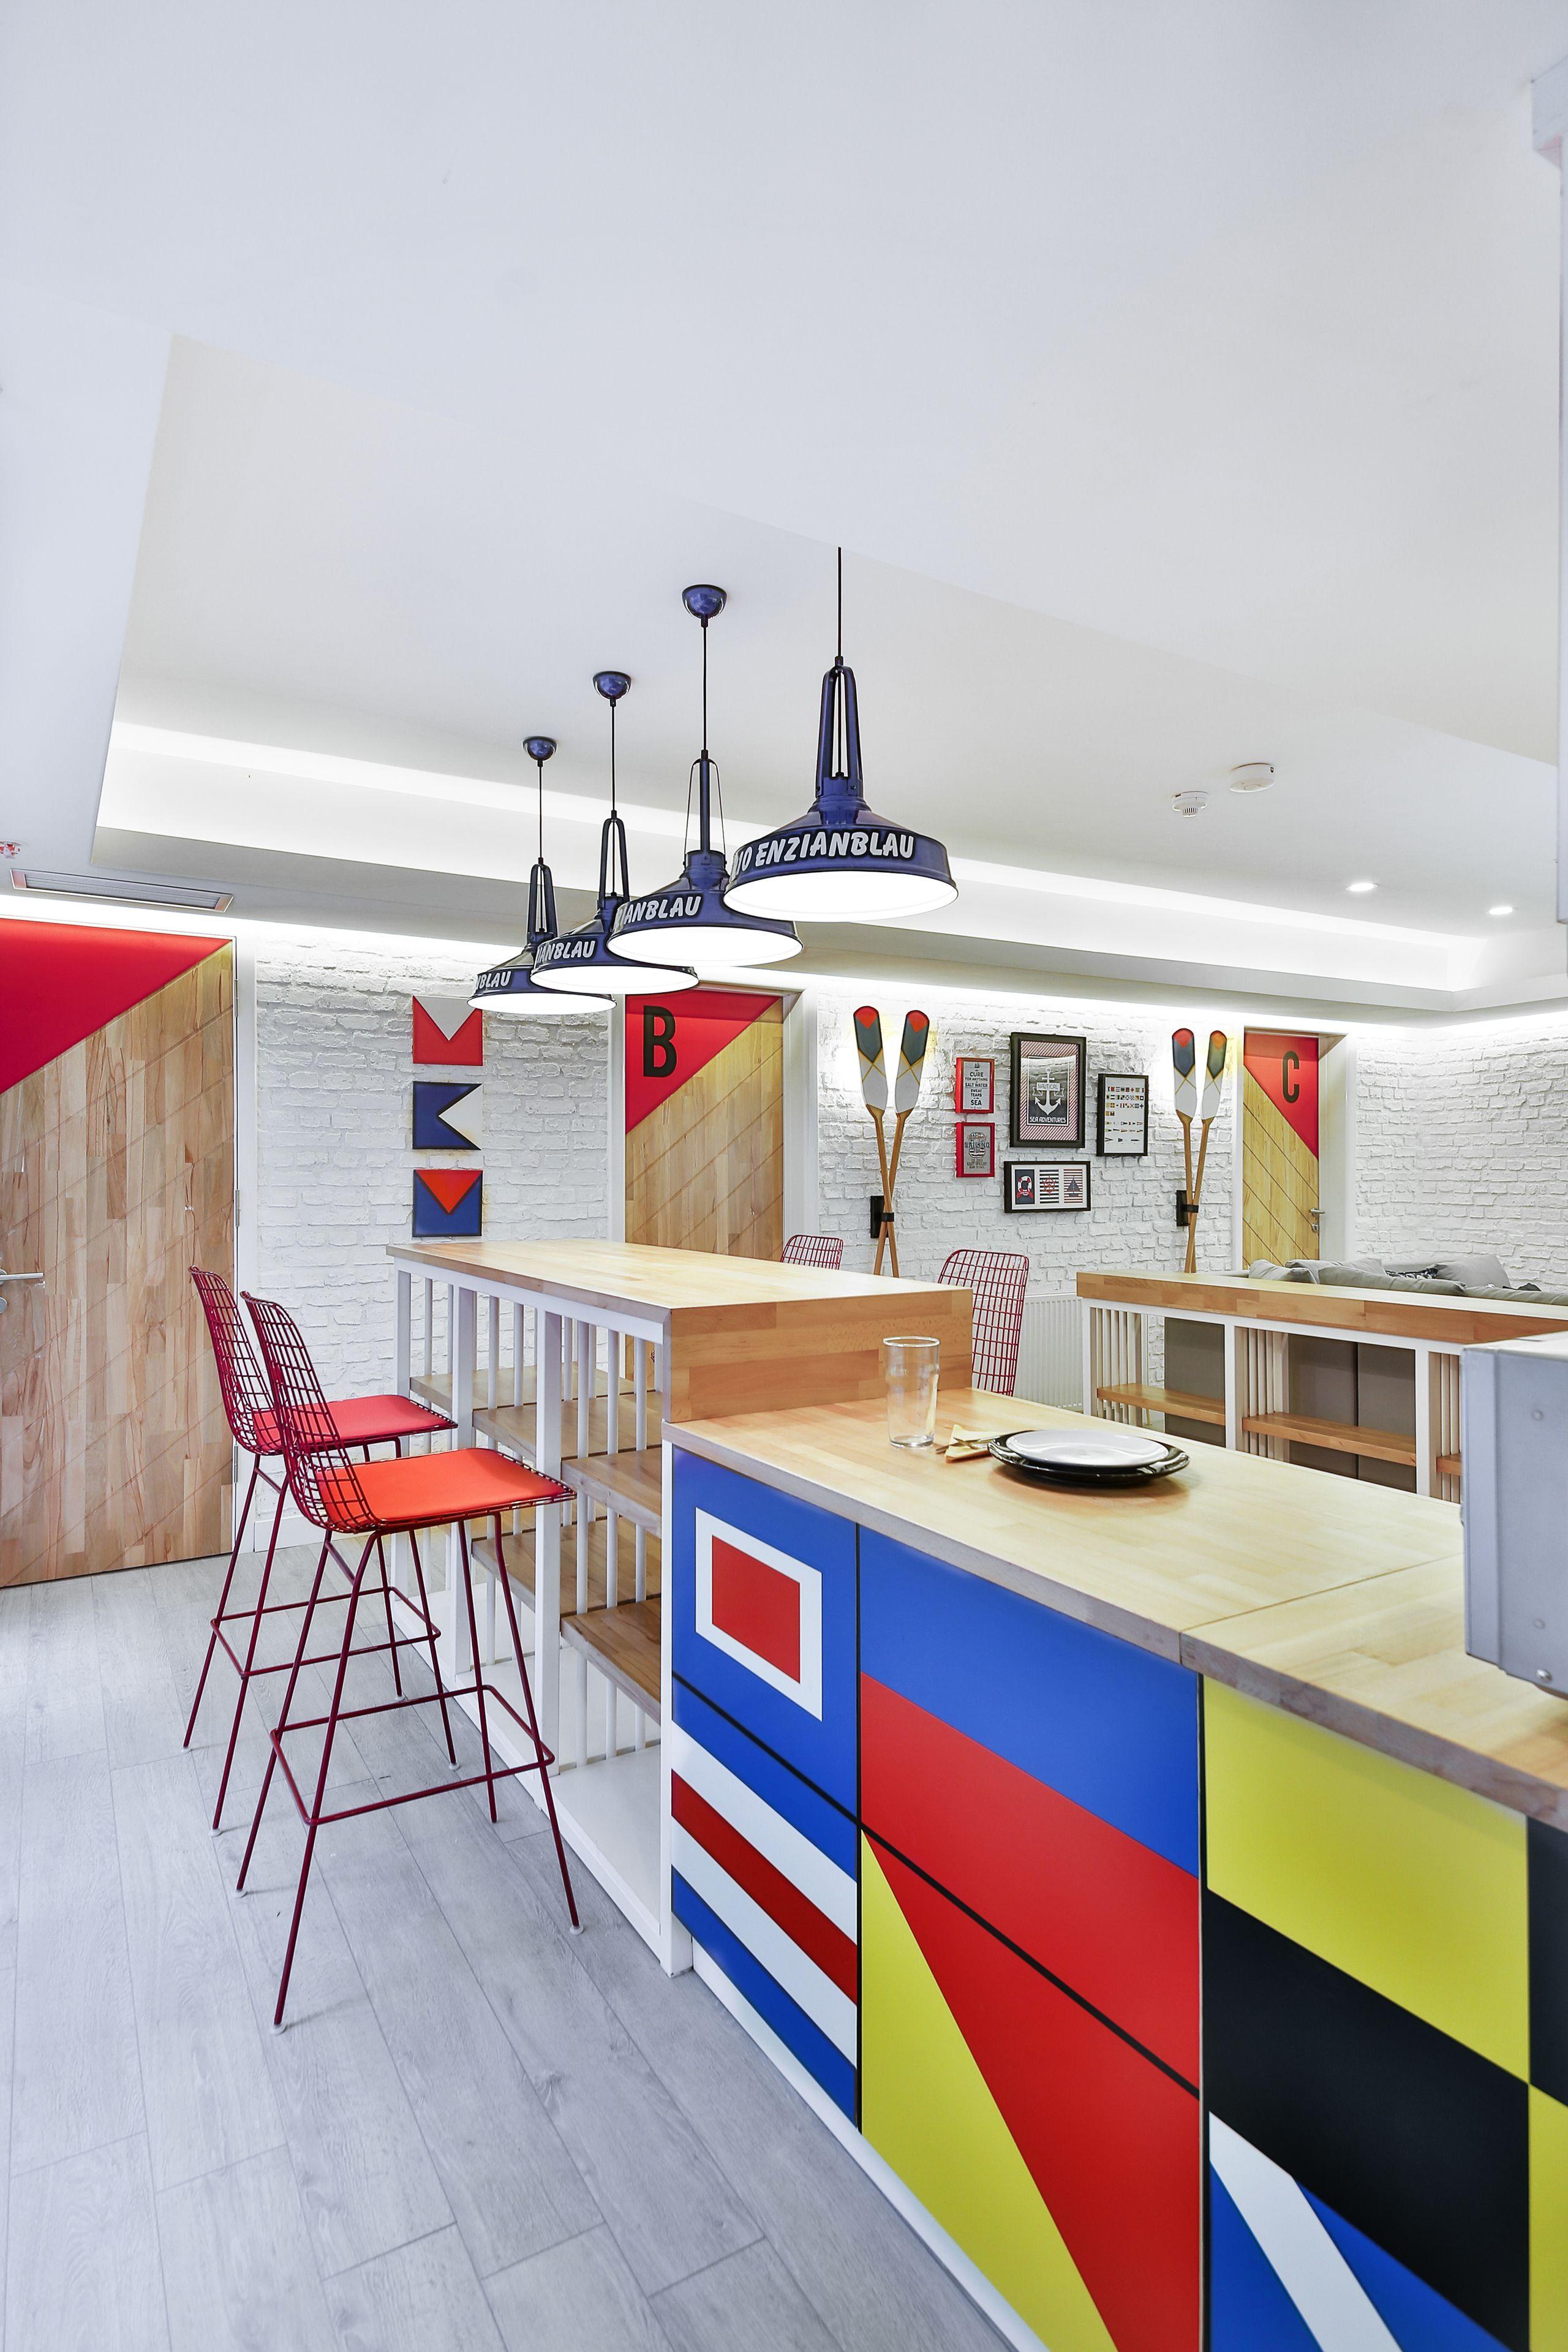 vip male dormitory marine concept interior design room #interiordesign #luxury #dormitory #dormitoryroom #marineinterior #conceptroom #marineconceptroom #rendahelindesign #interiorroomforboys